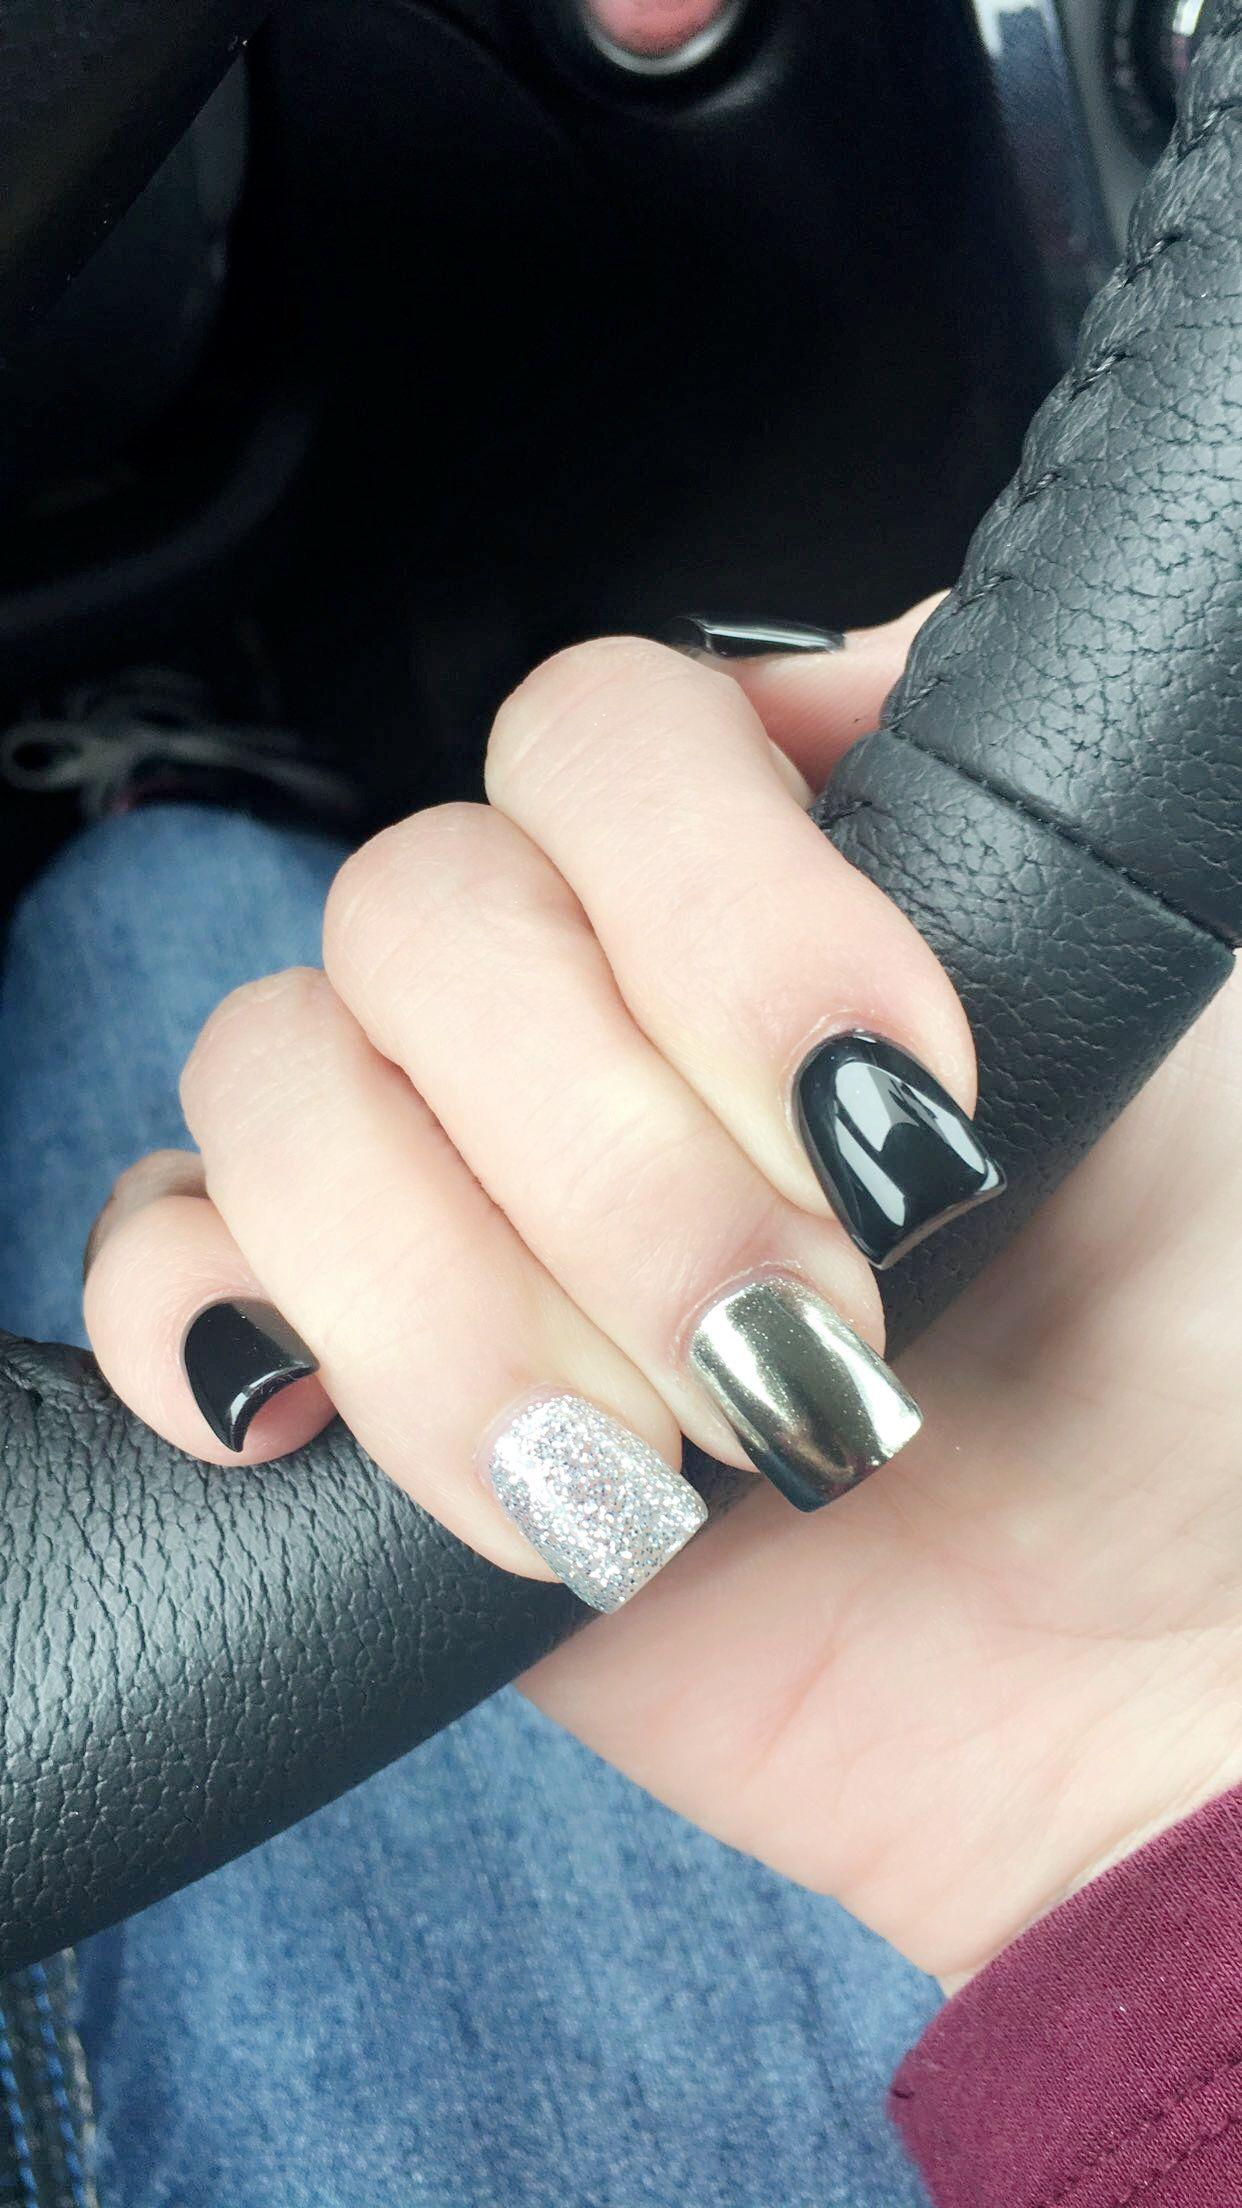 Black Silver Glitter Metallic Nails Short Acrylic Square Short Acrylic Nails Acrylic Nail Shapes Best Acrylic Nails